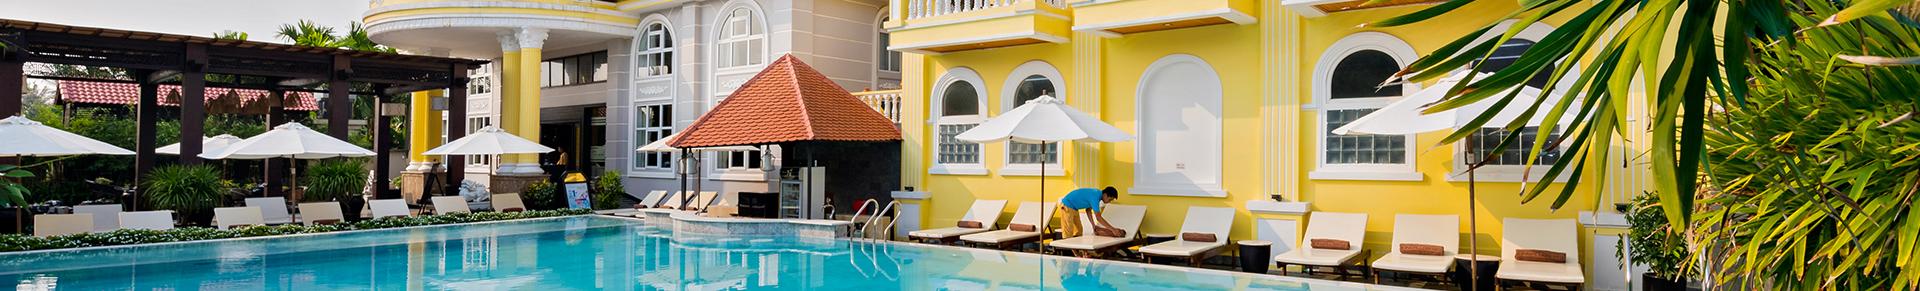 Le Pavillon Luxury Resort & Spa Facilities